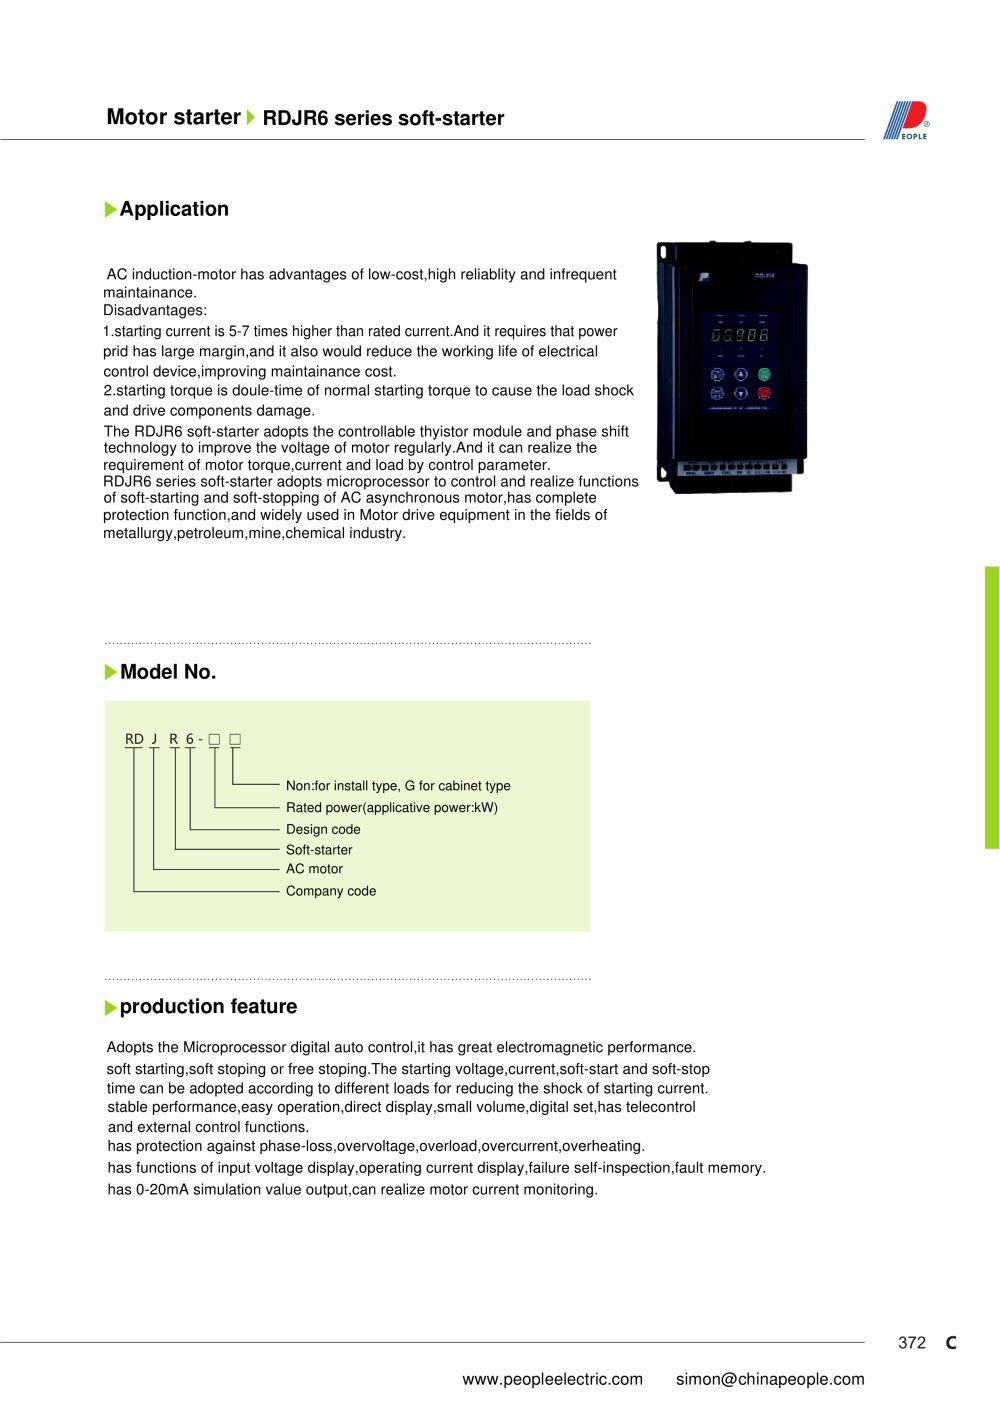 RDJR6 series soft-starter - 1 / 7 Pages